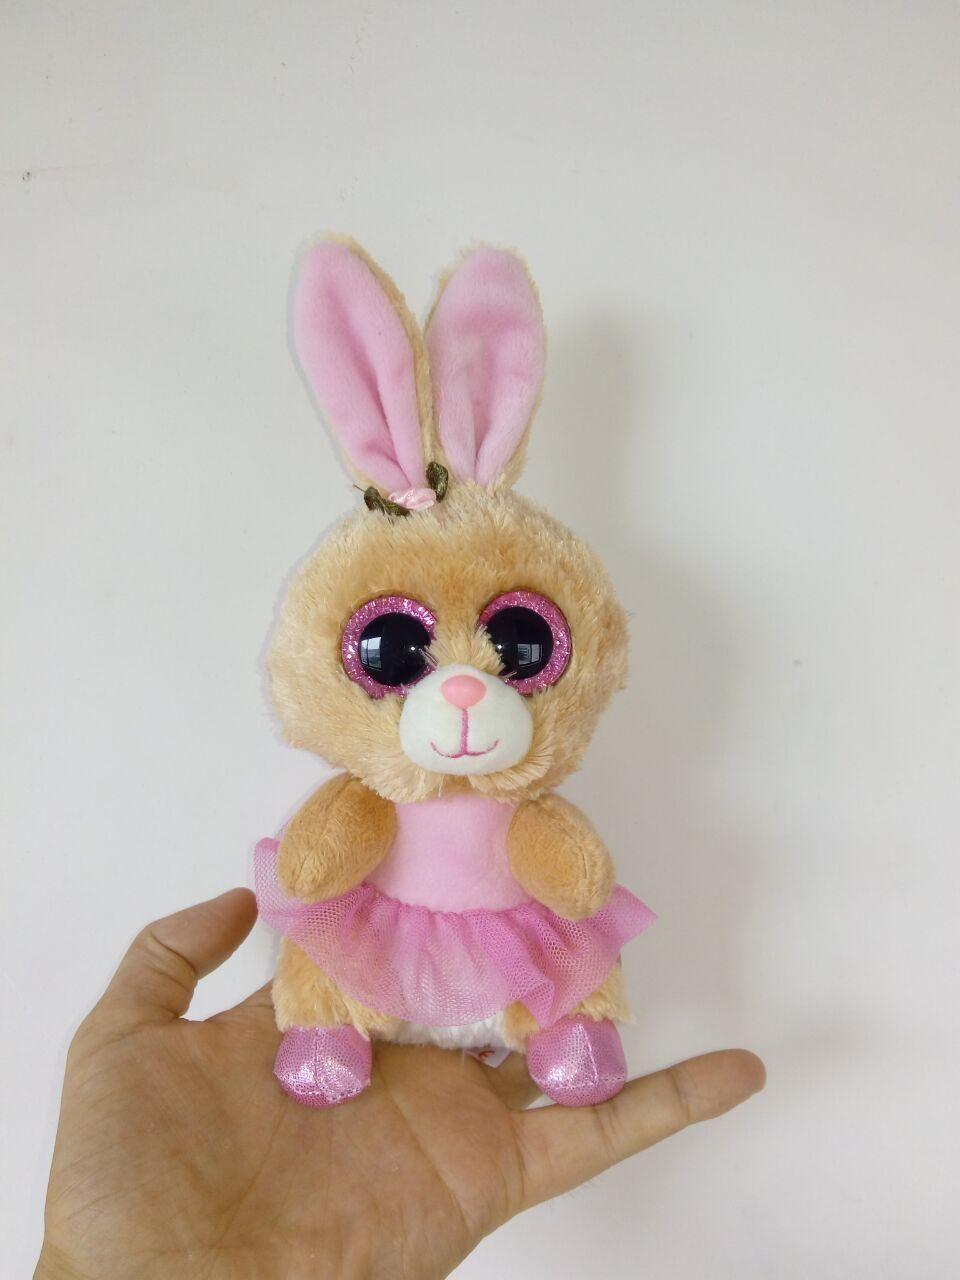 Big Eyes Beanie Boos Kids Ty Stuffed Plush Toys Colorful Muslin ... cb42d2b90269